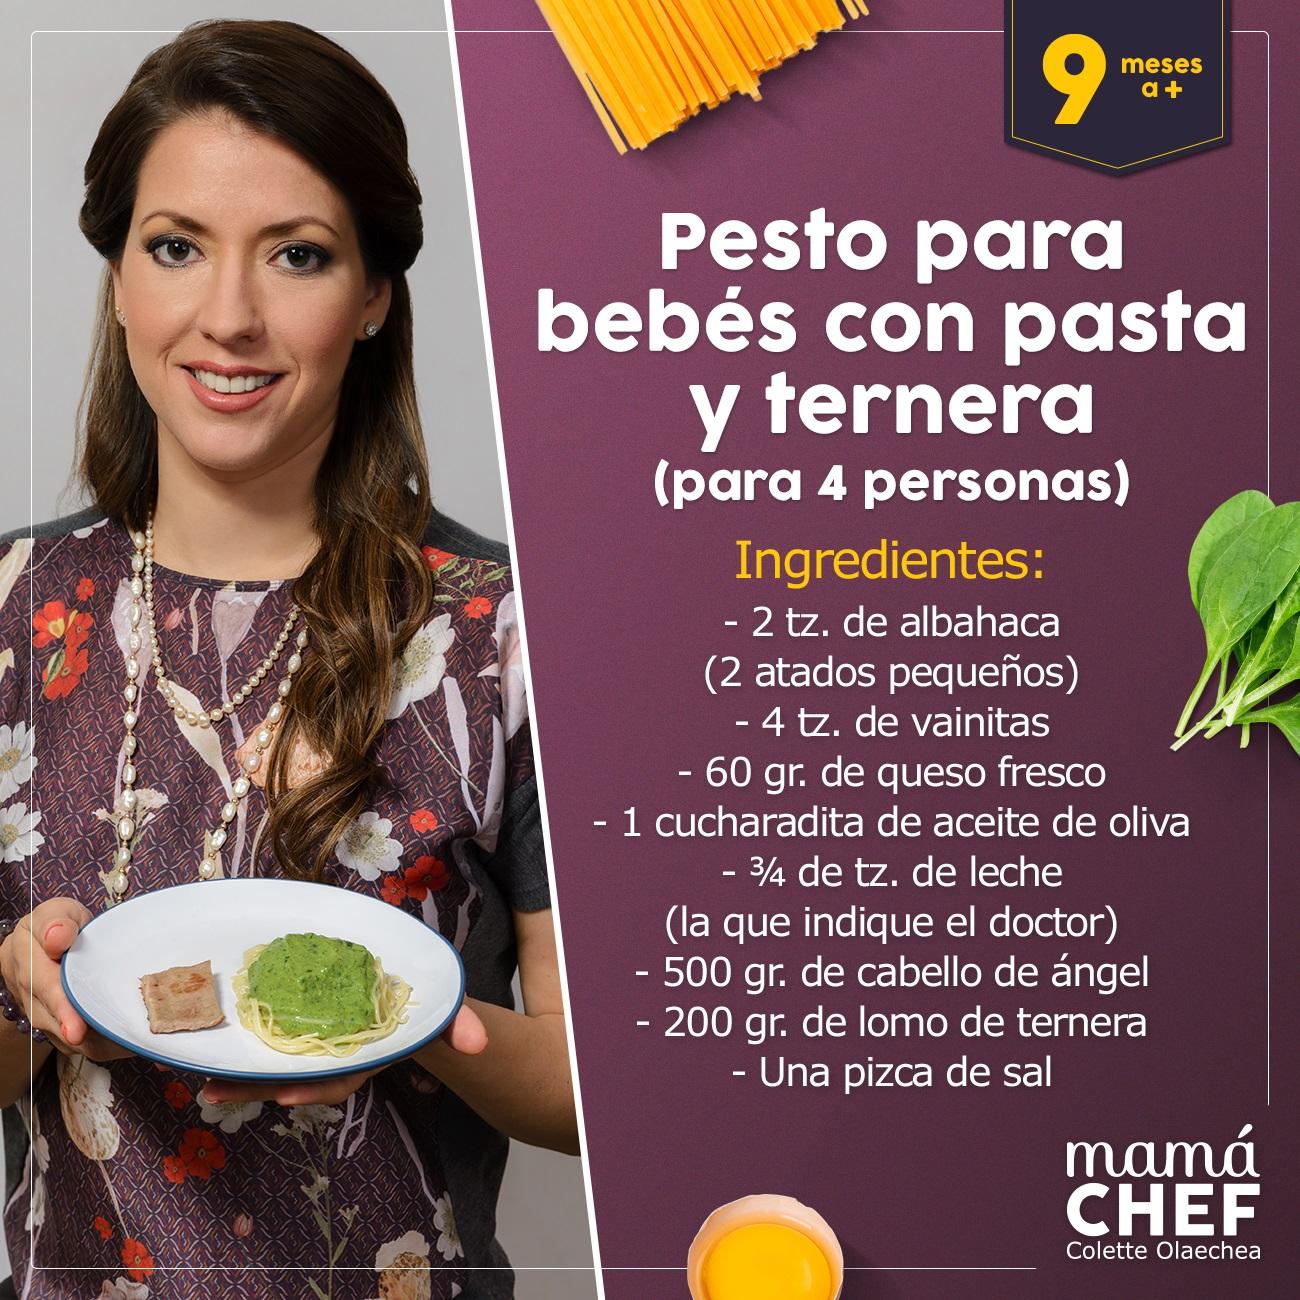 Pesto-con-ternera Mama Chef Colette Olaechea  papillas para bebes 9 meses